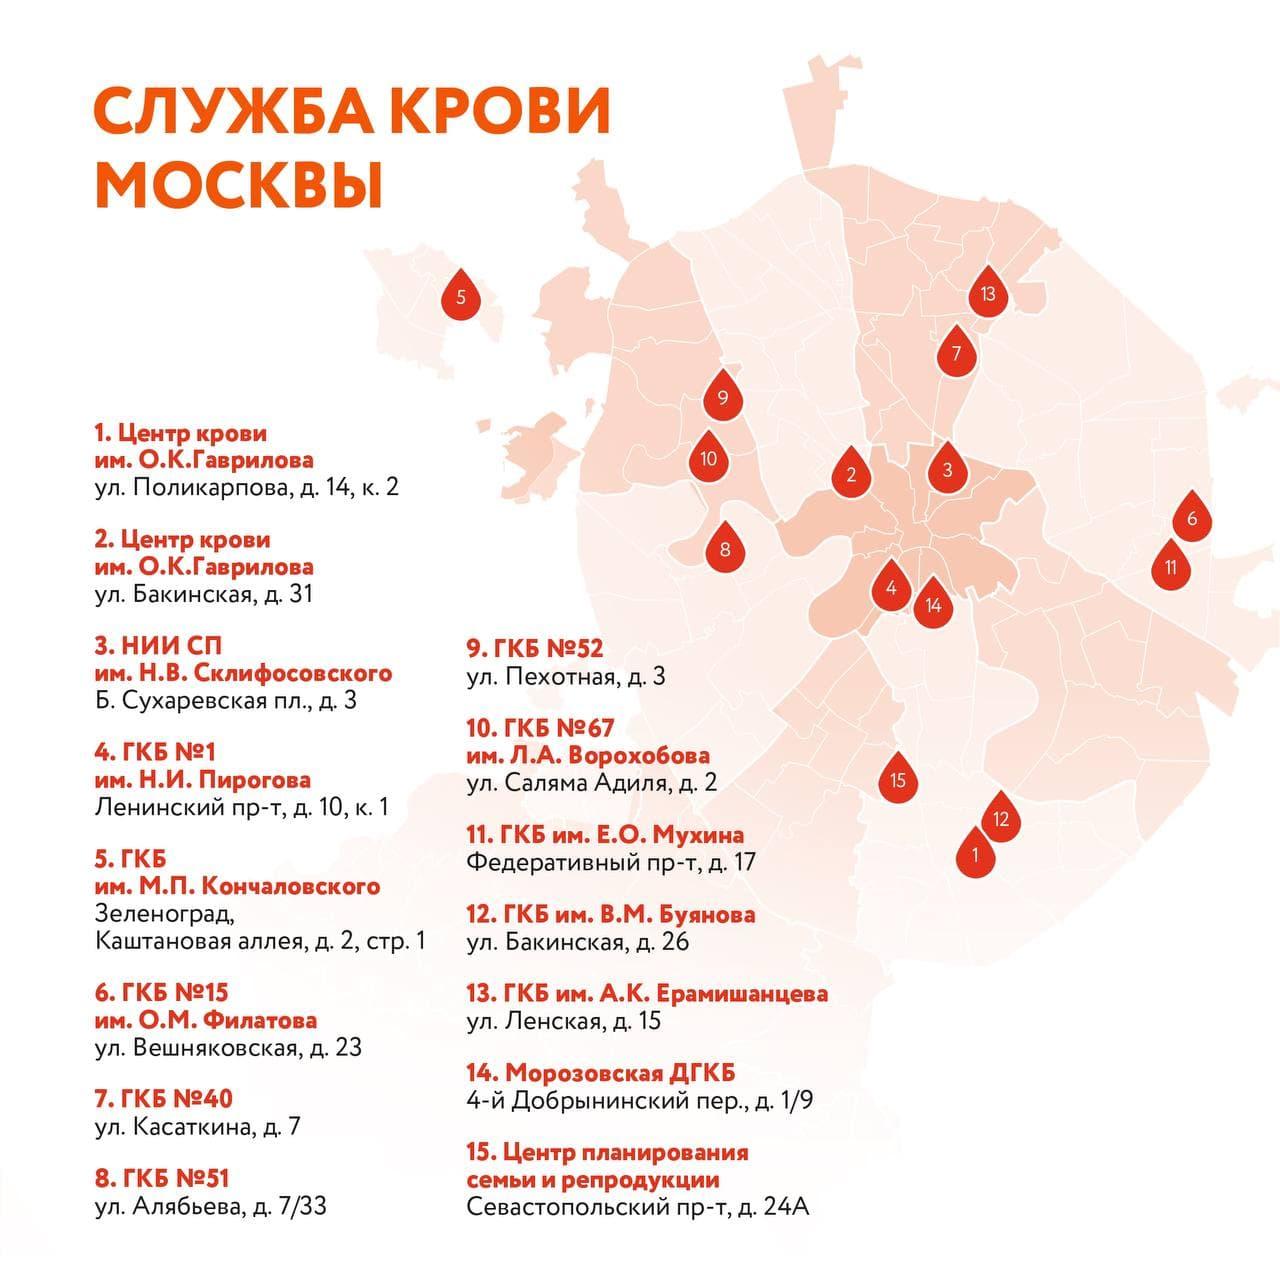 Служба крови